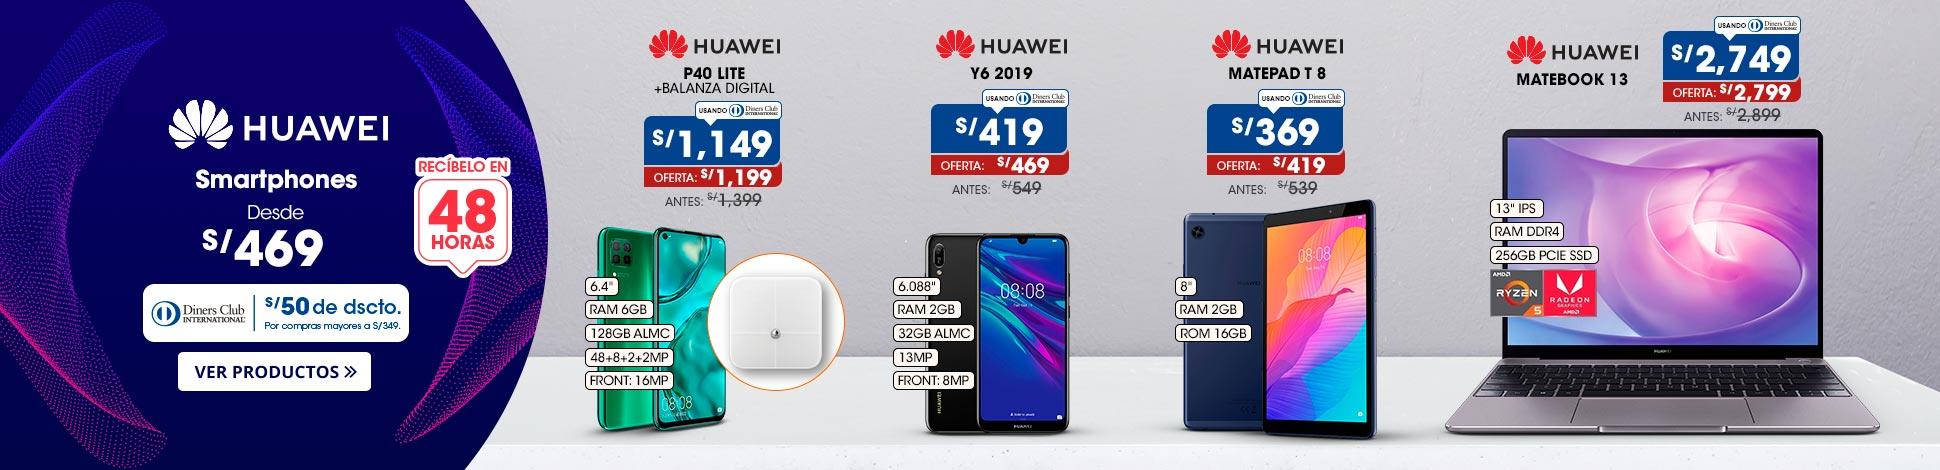 hs-deals-huawei.jpg | Juntoz.com